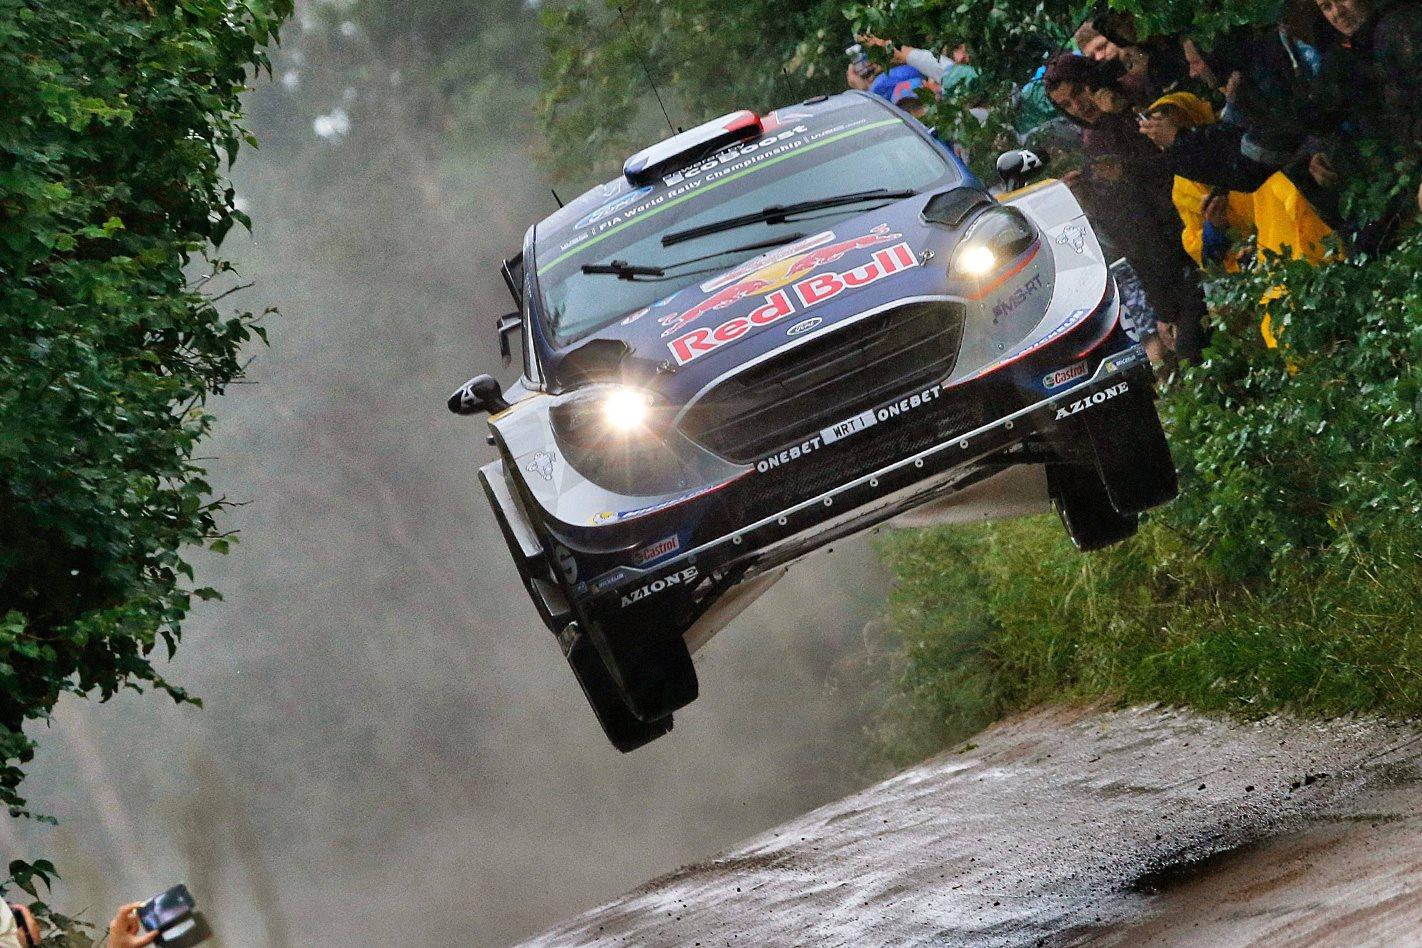 2015-Ford-Fiesta-ST-WRC-rally-offroad.jpg